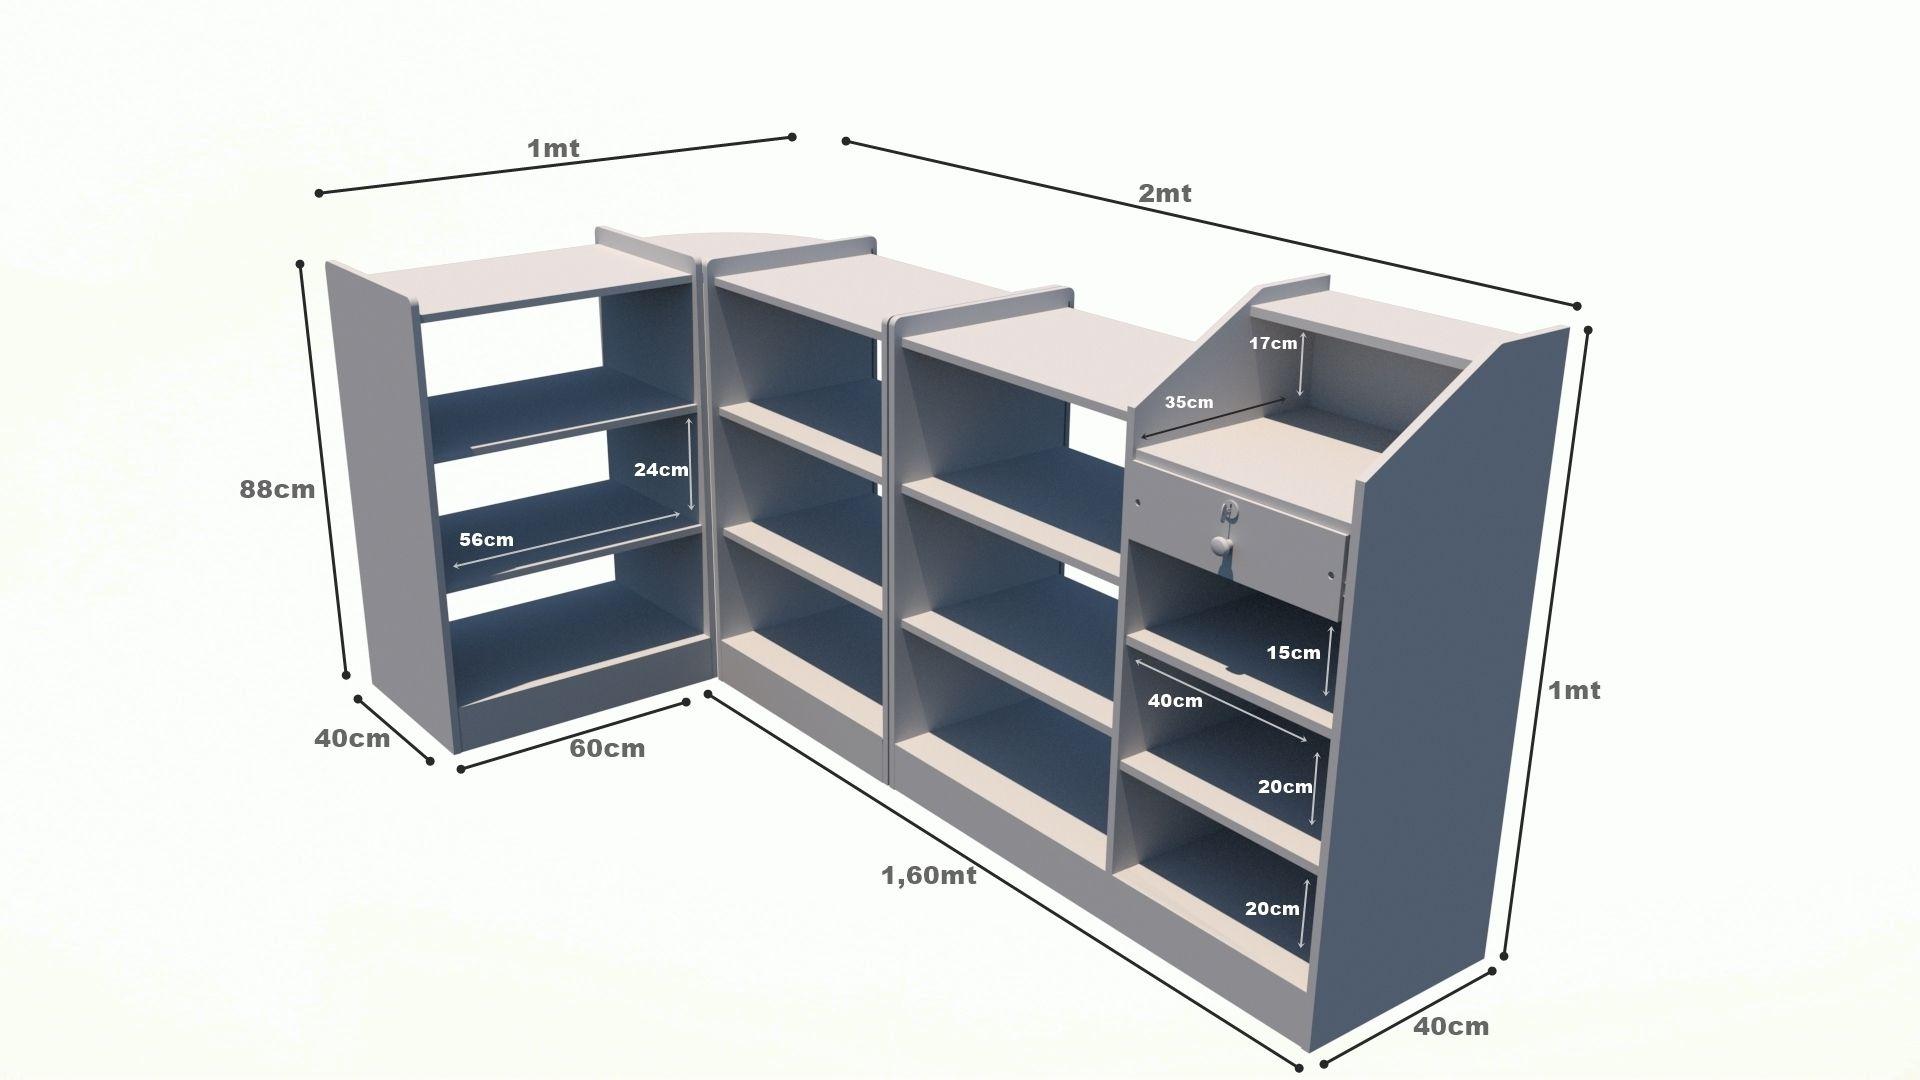 Balcão Caixa Vitrine Modular M2 (expositor, prateleira, atendimento, loja, pet)